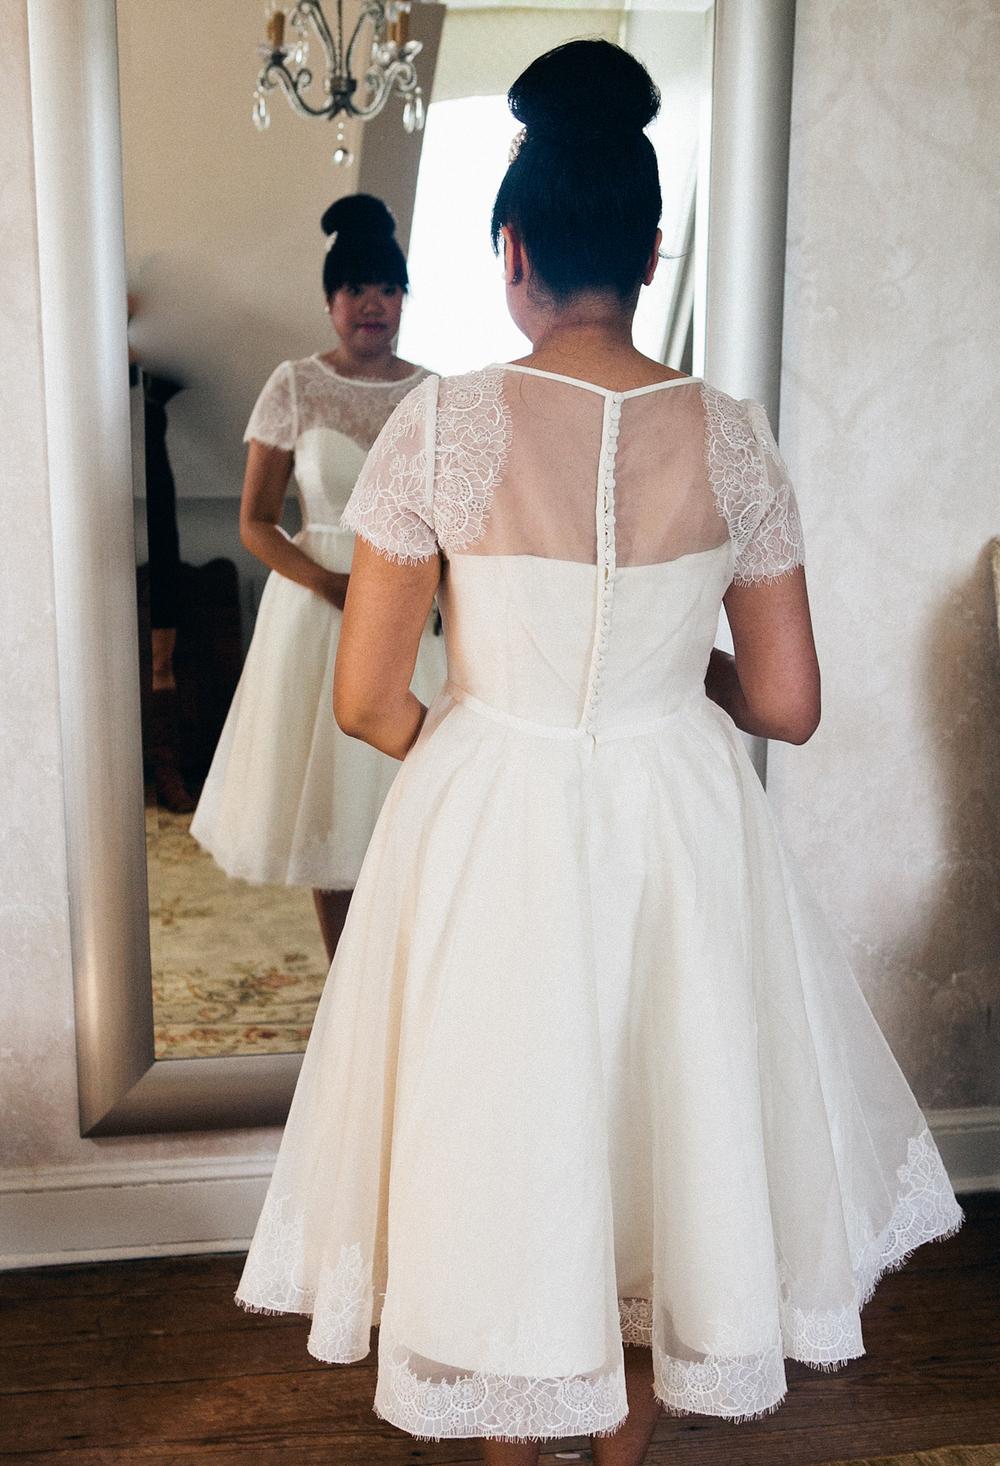 lisa_alan_billingsley_house_wedding_photography_im_kristen_maryland86of216.jpg~original.jpeg